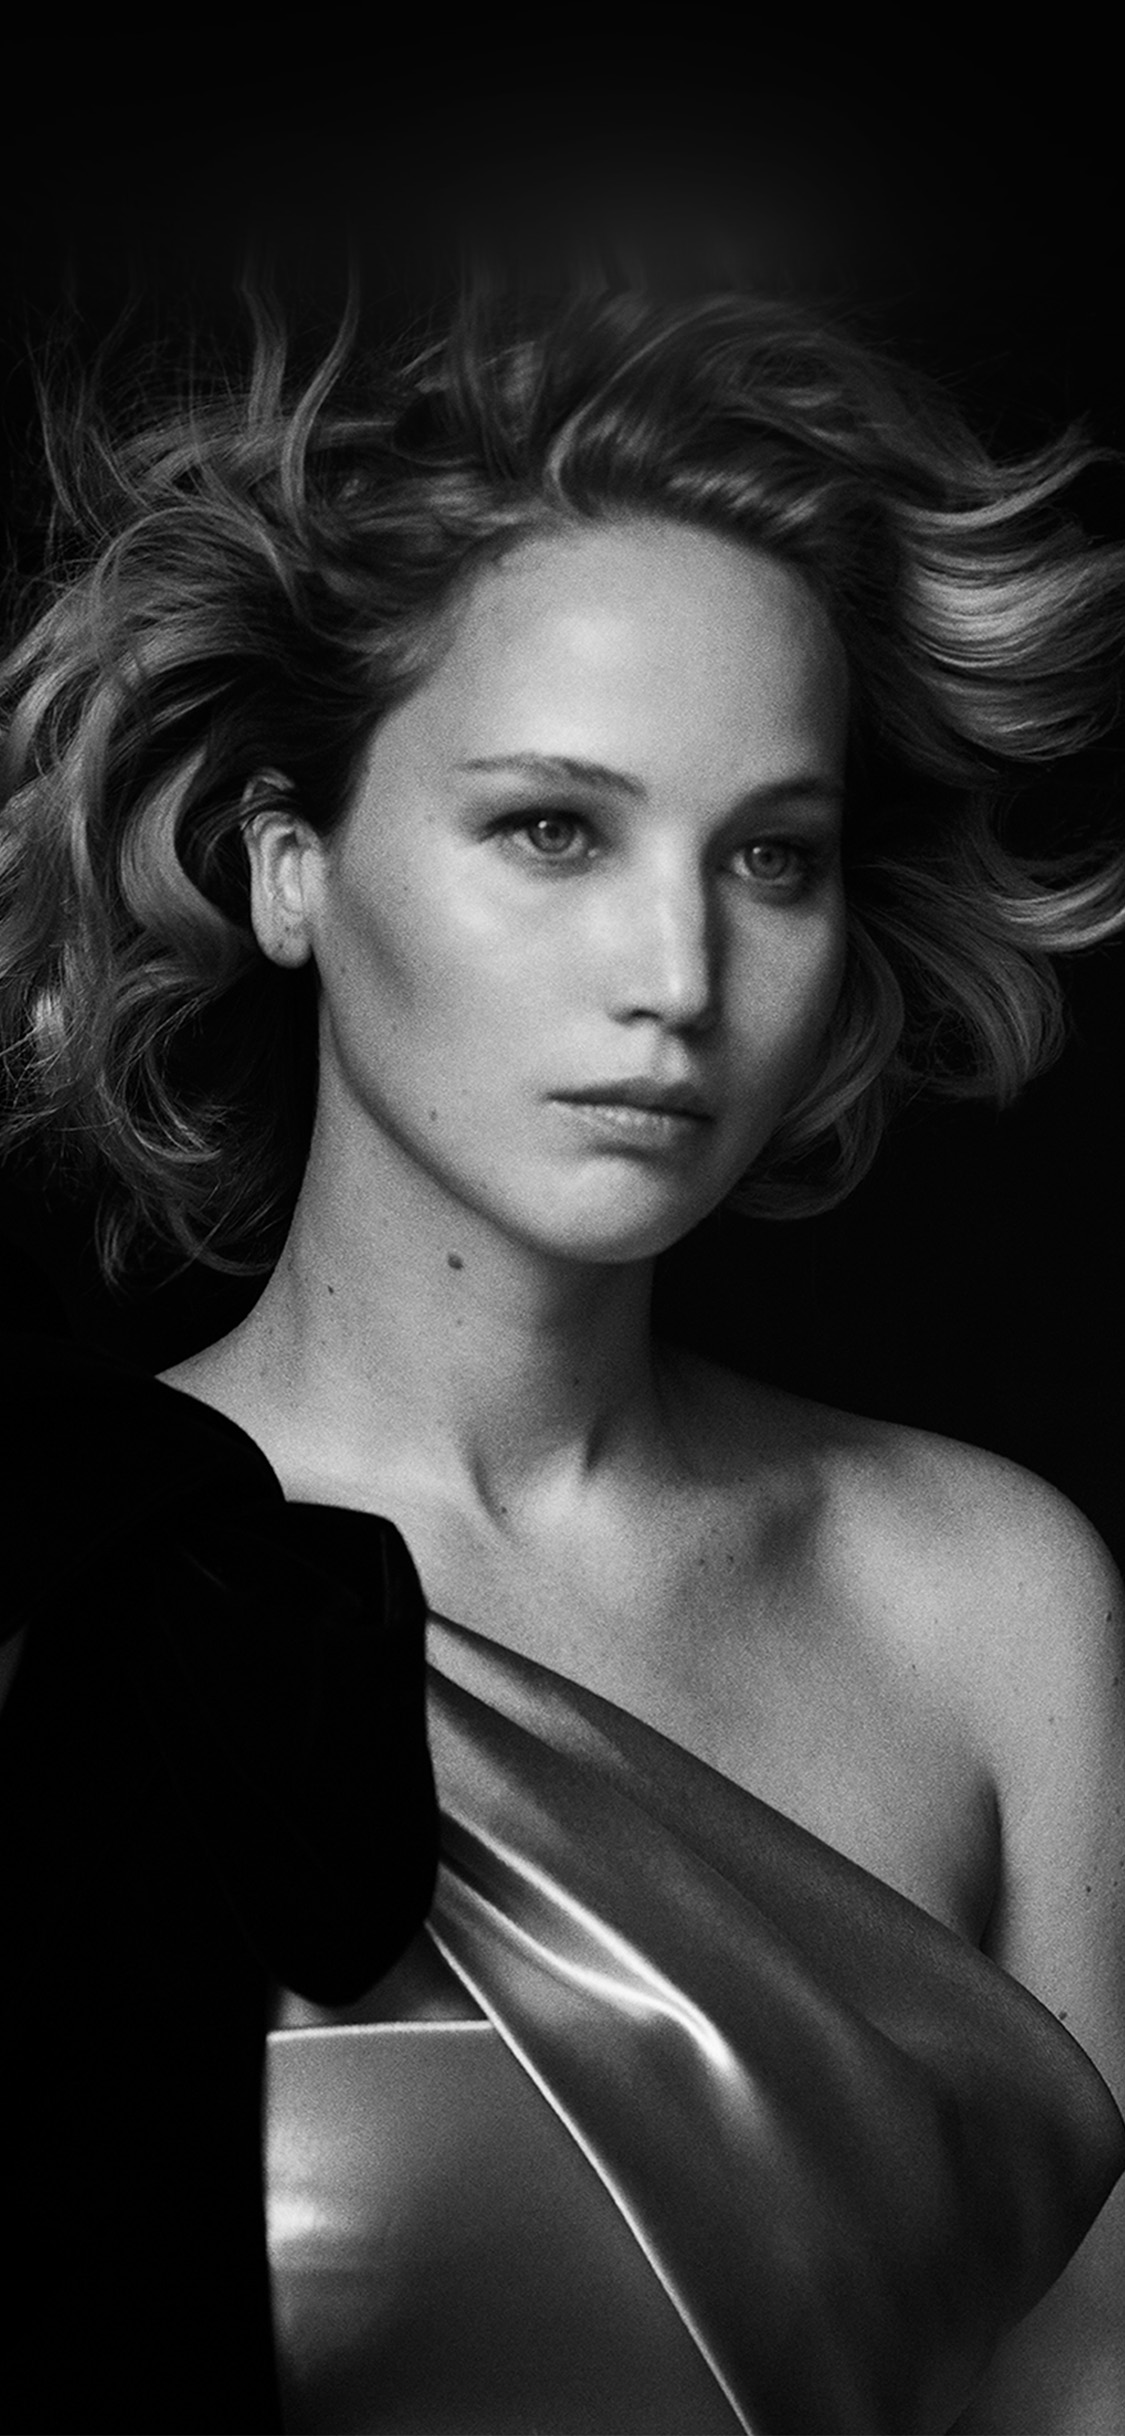 Girl celebrity film actress iPhone X wallpaper